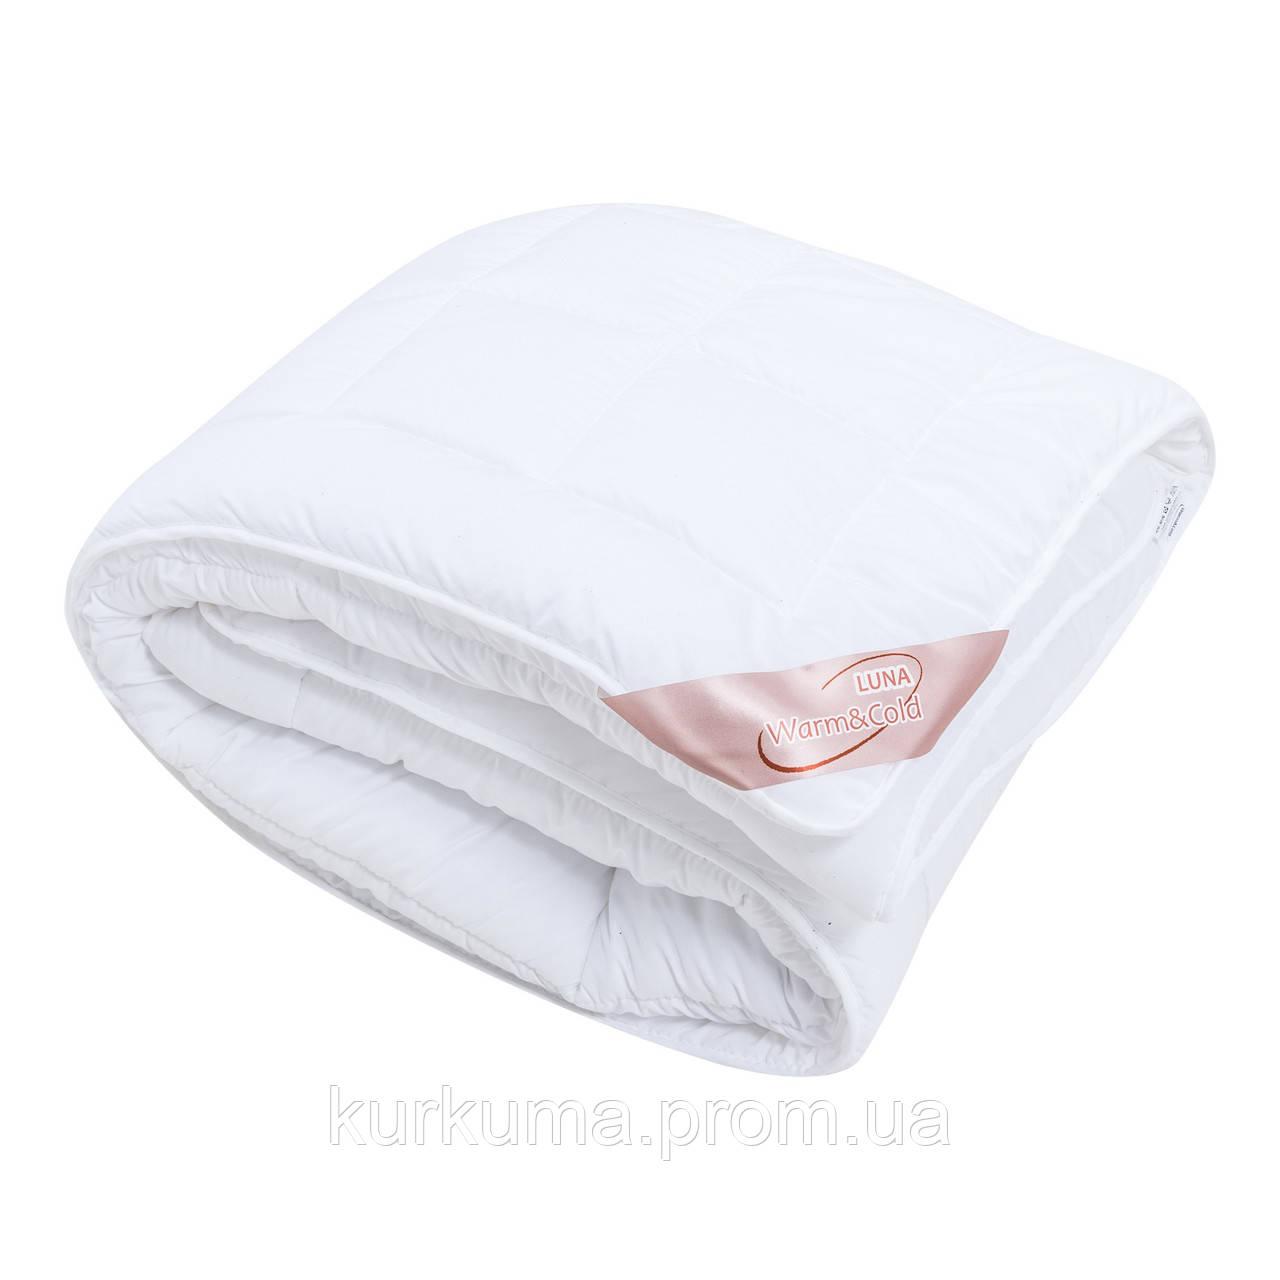 Одеяло LUNA WARM-COLD 160x200 см